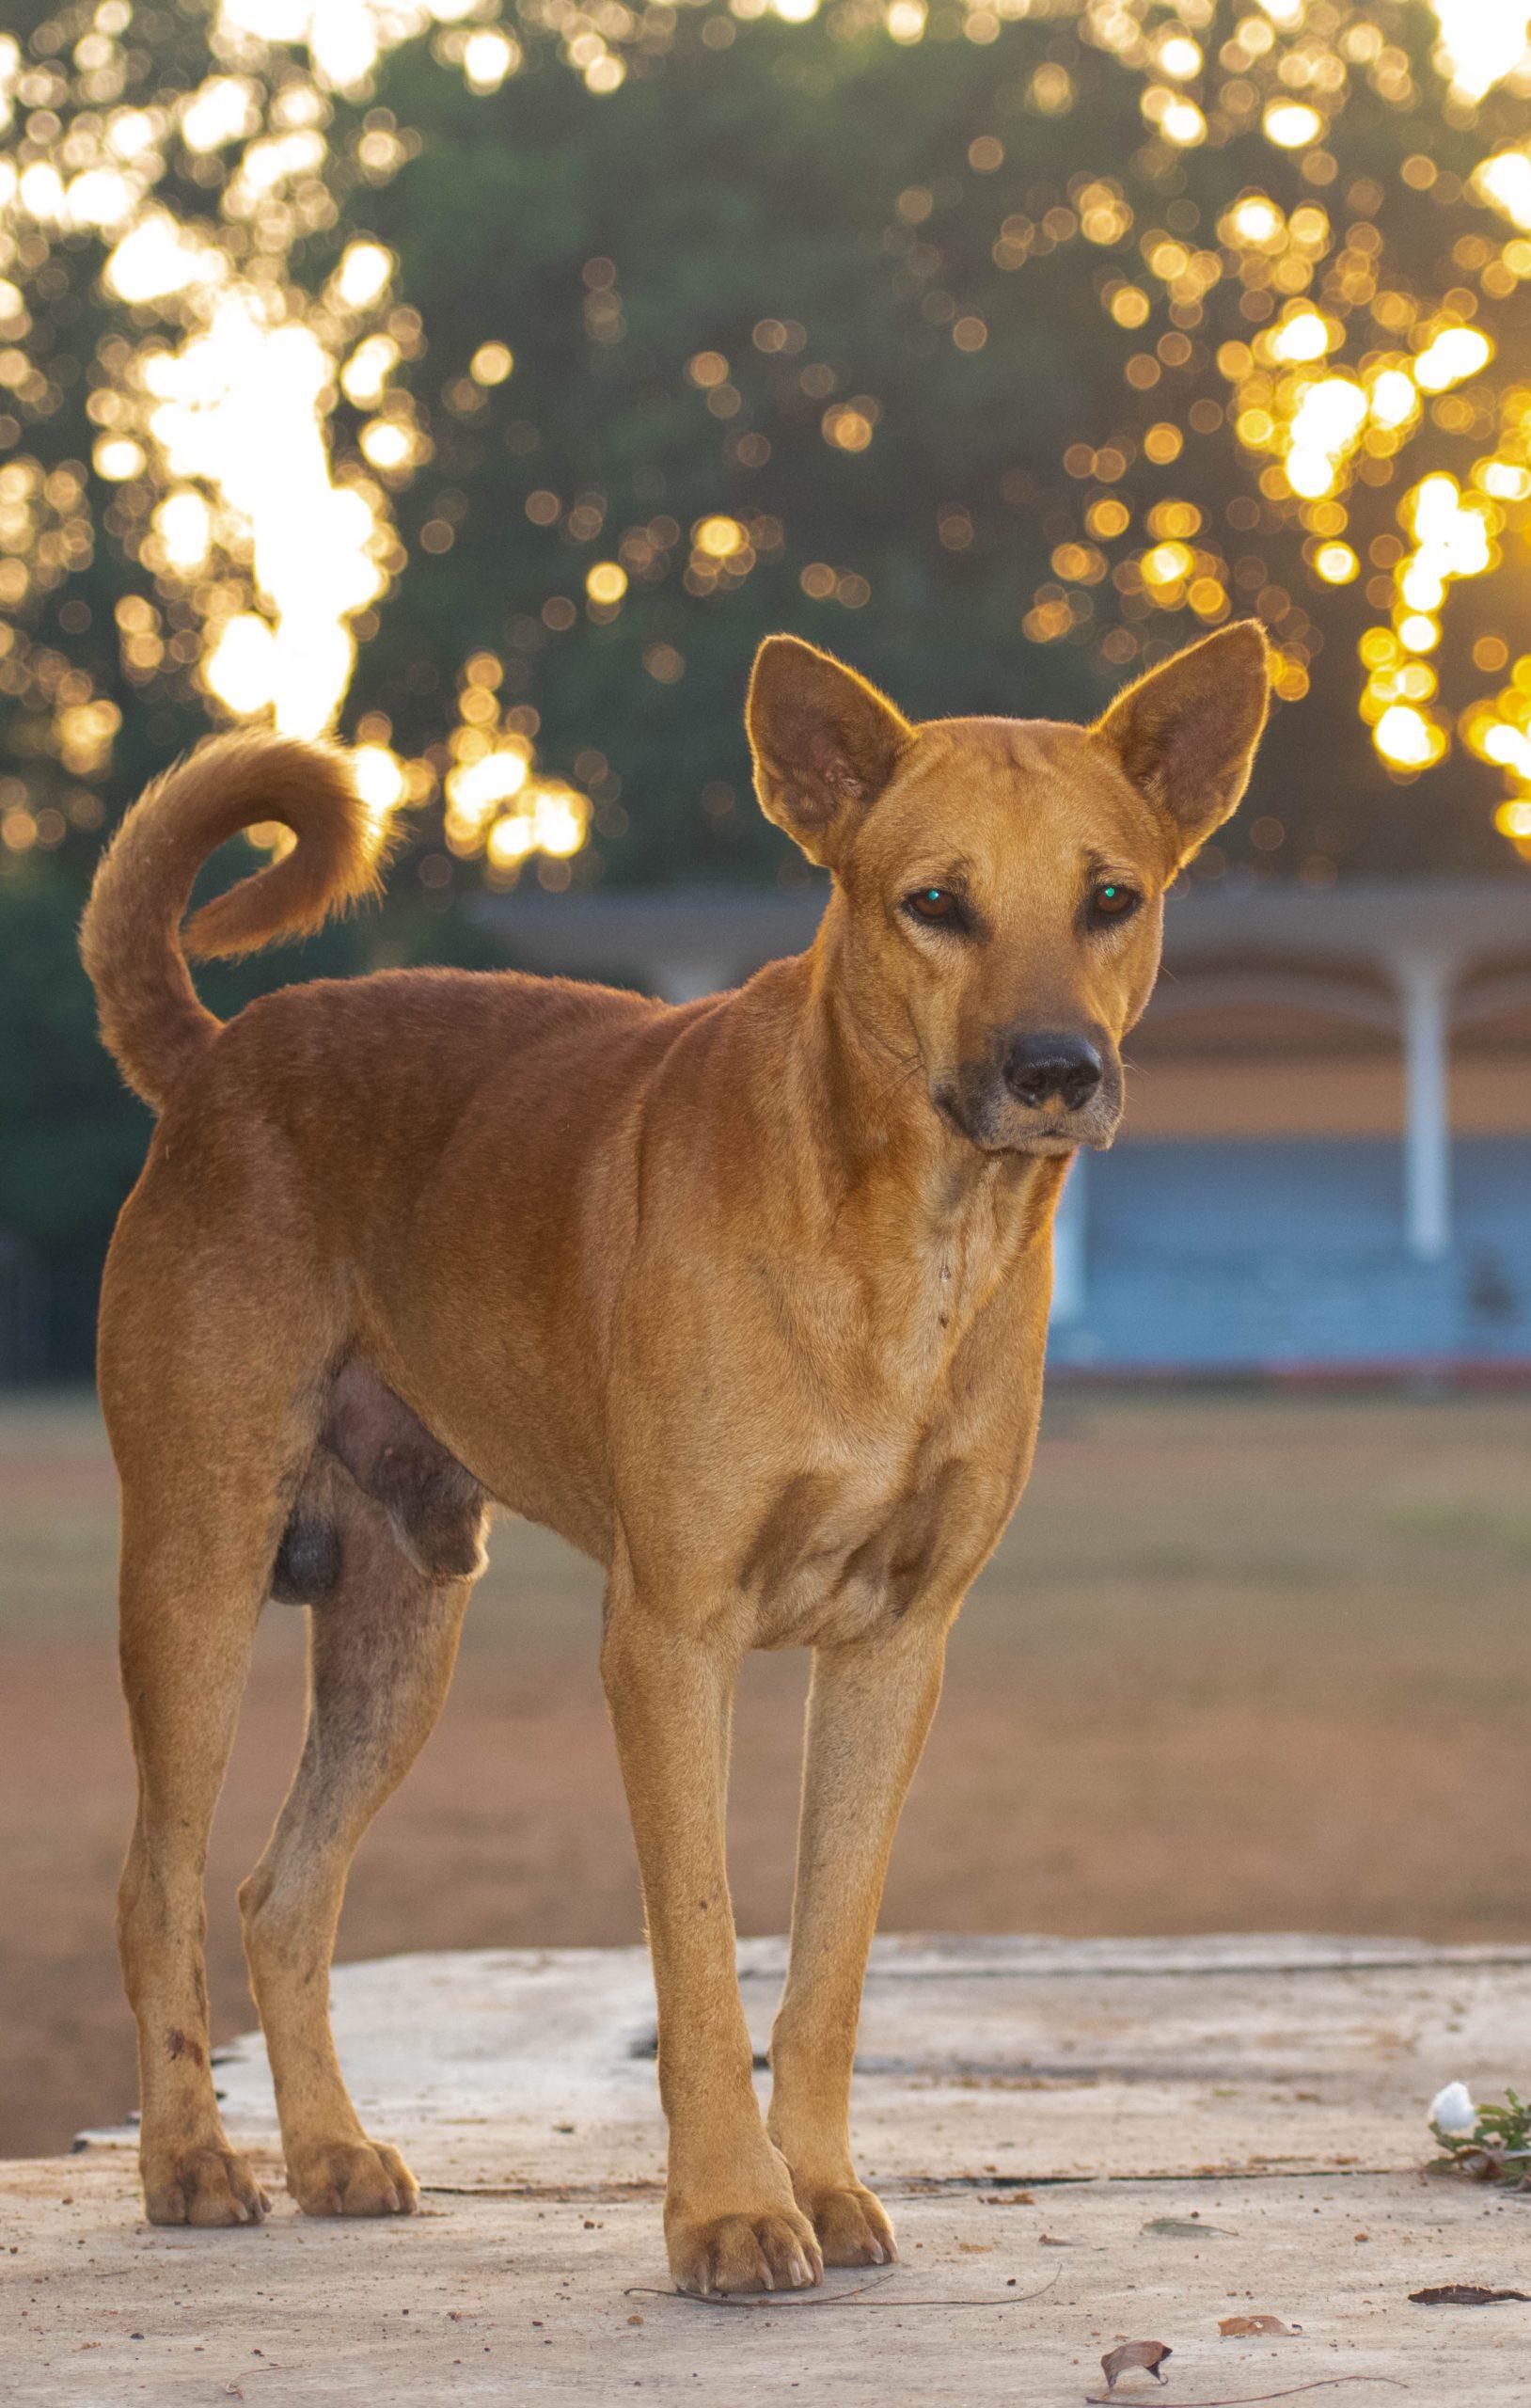 a stray dog